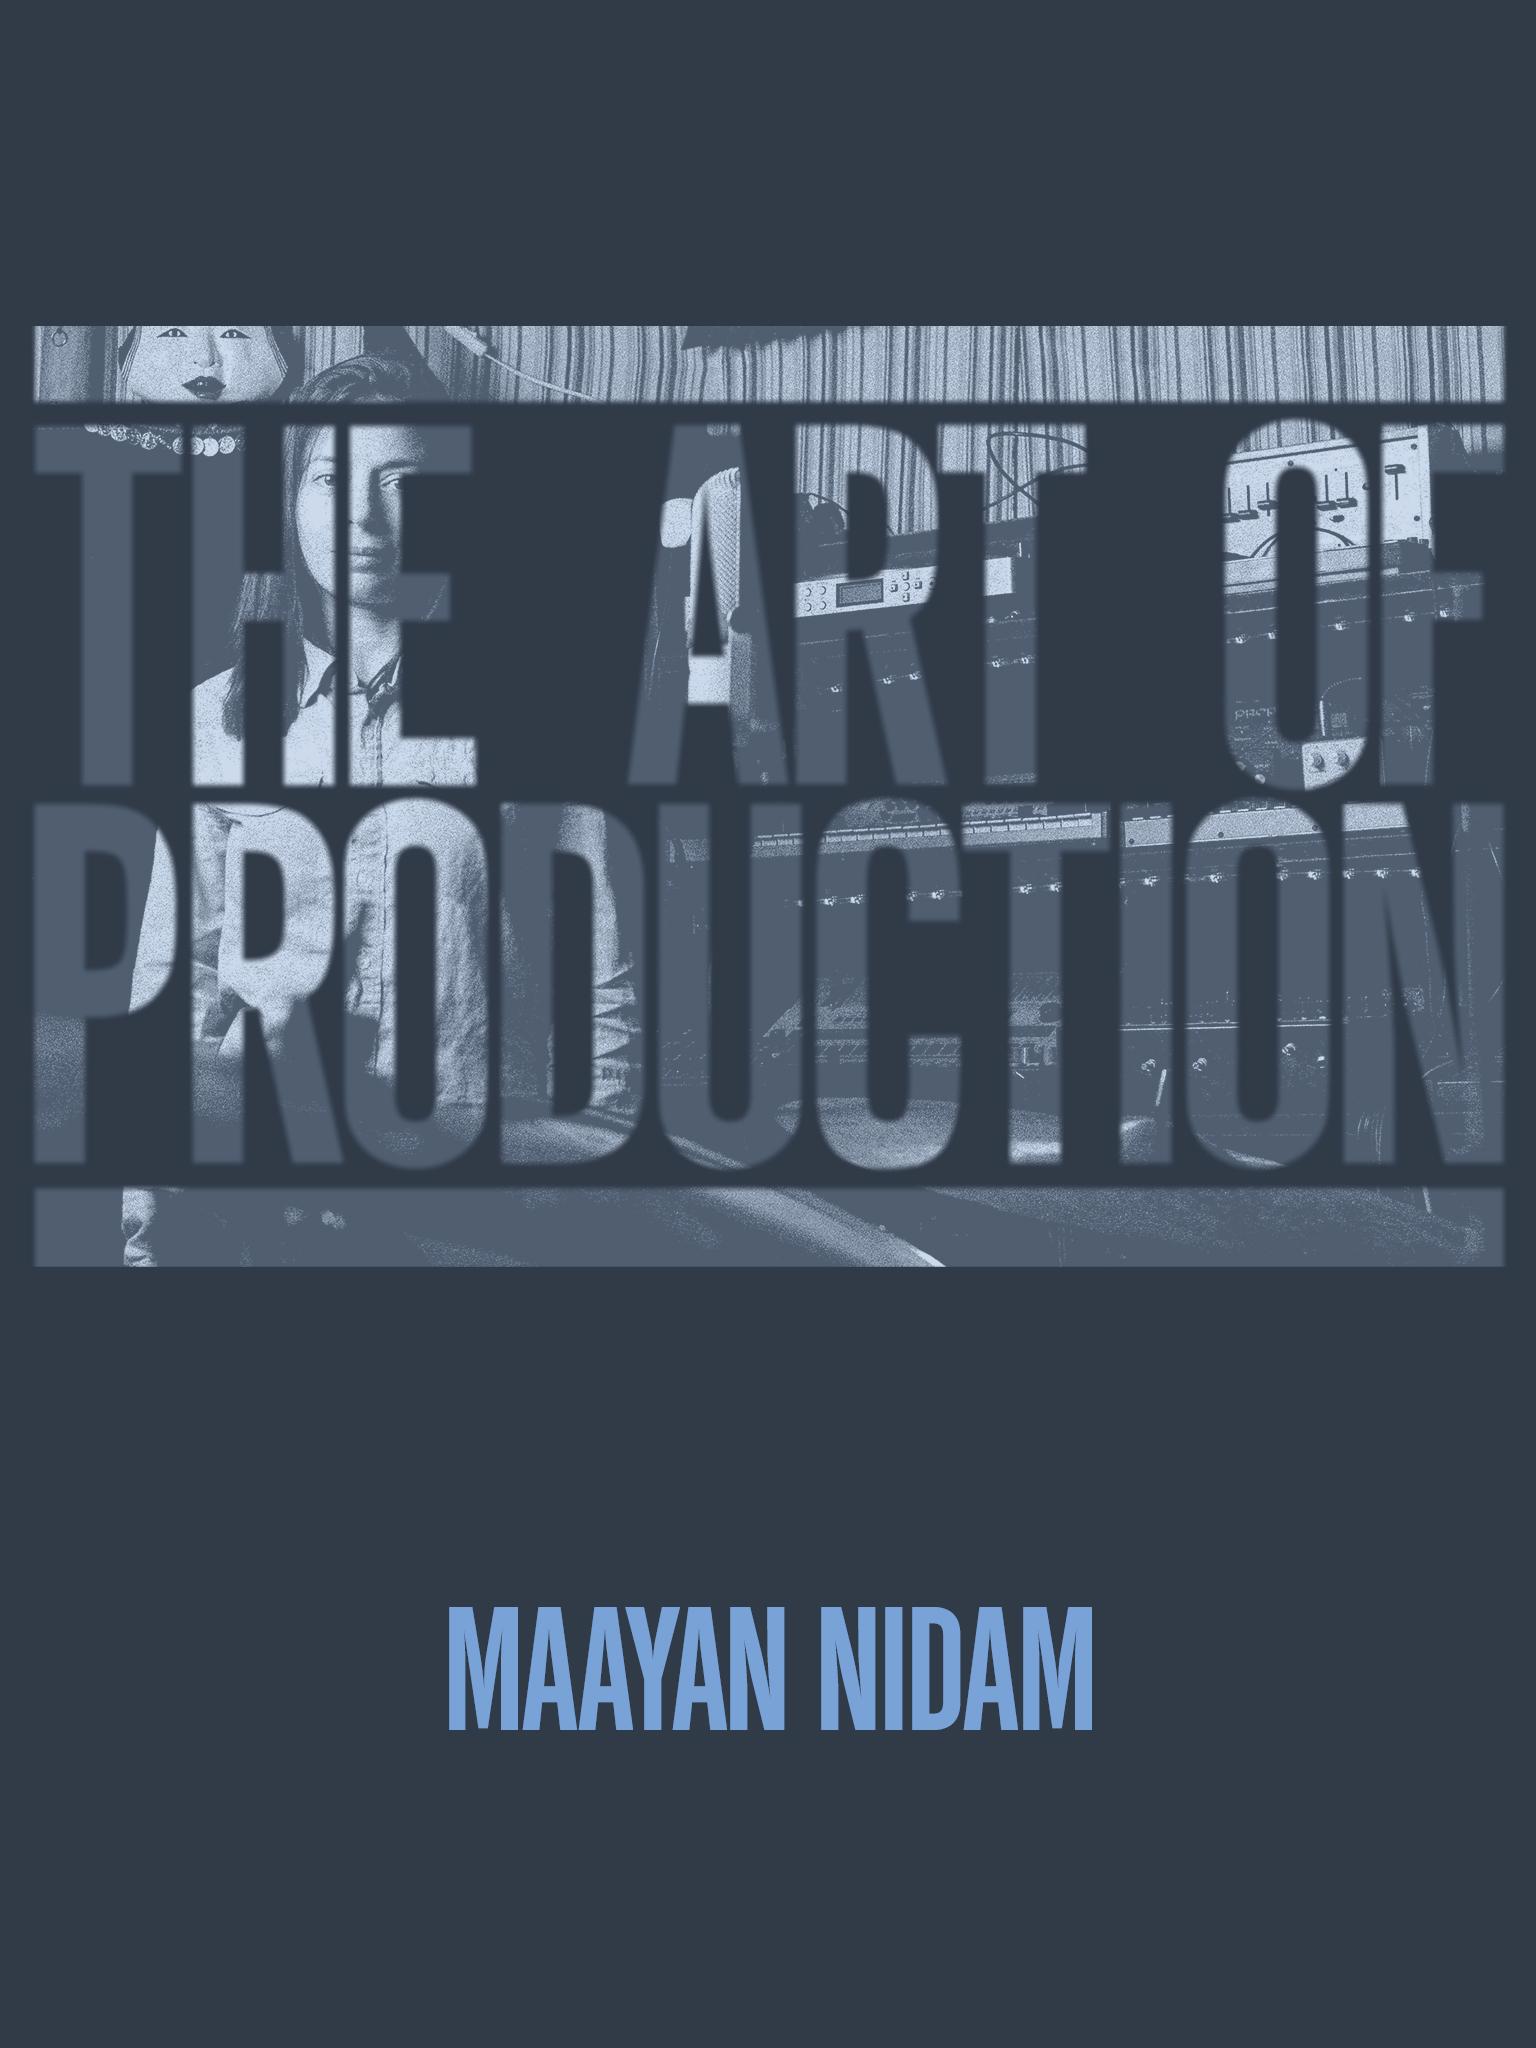 The Art Of Production: Maayan Nidam